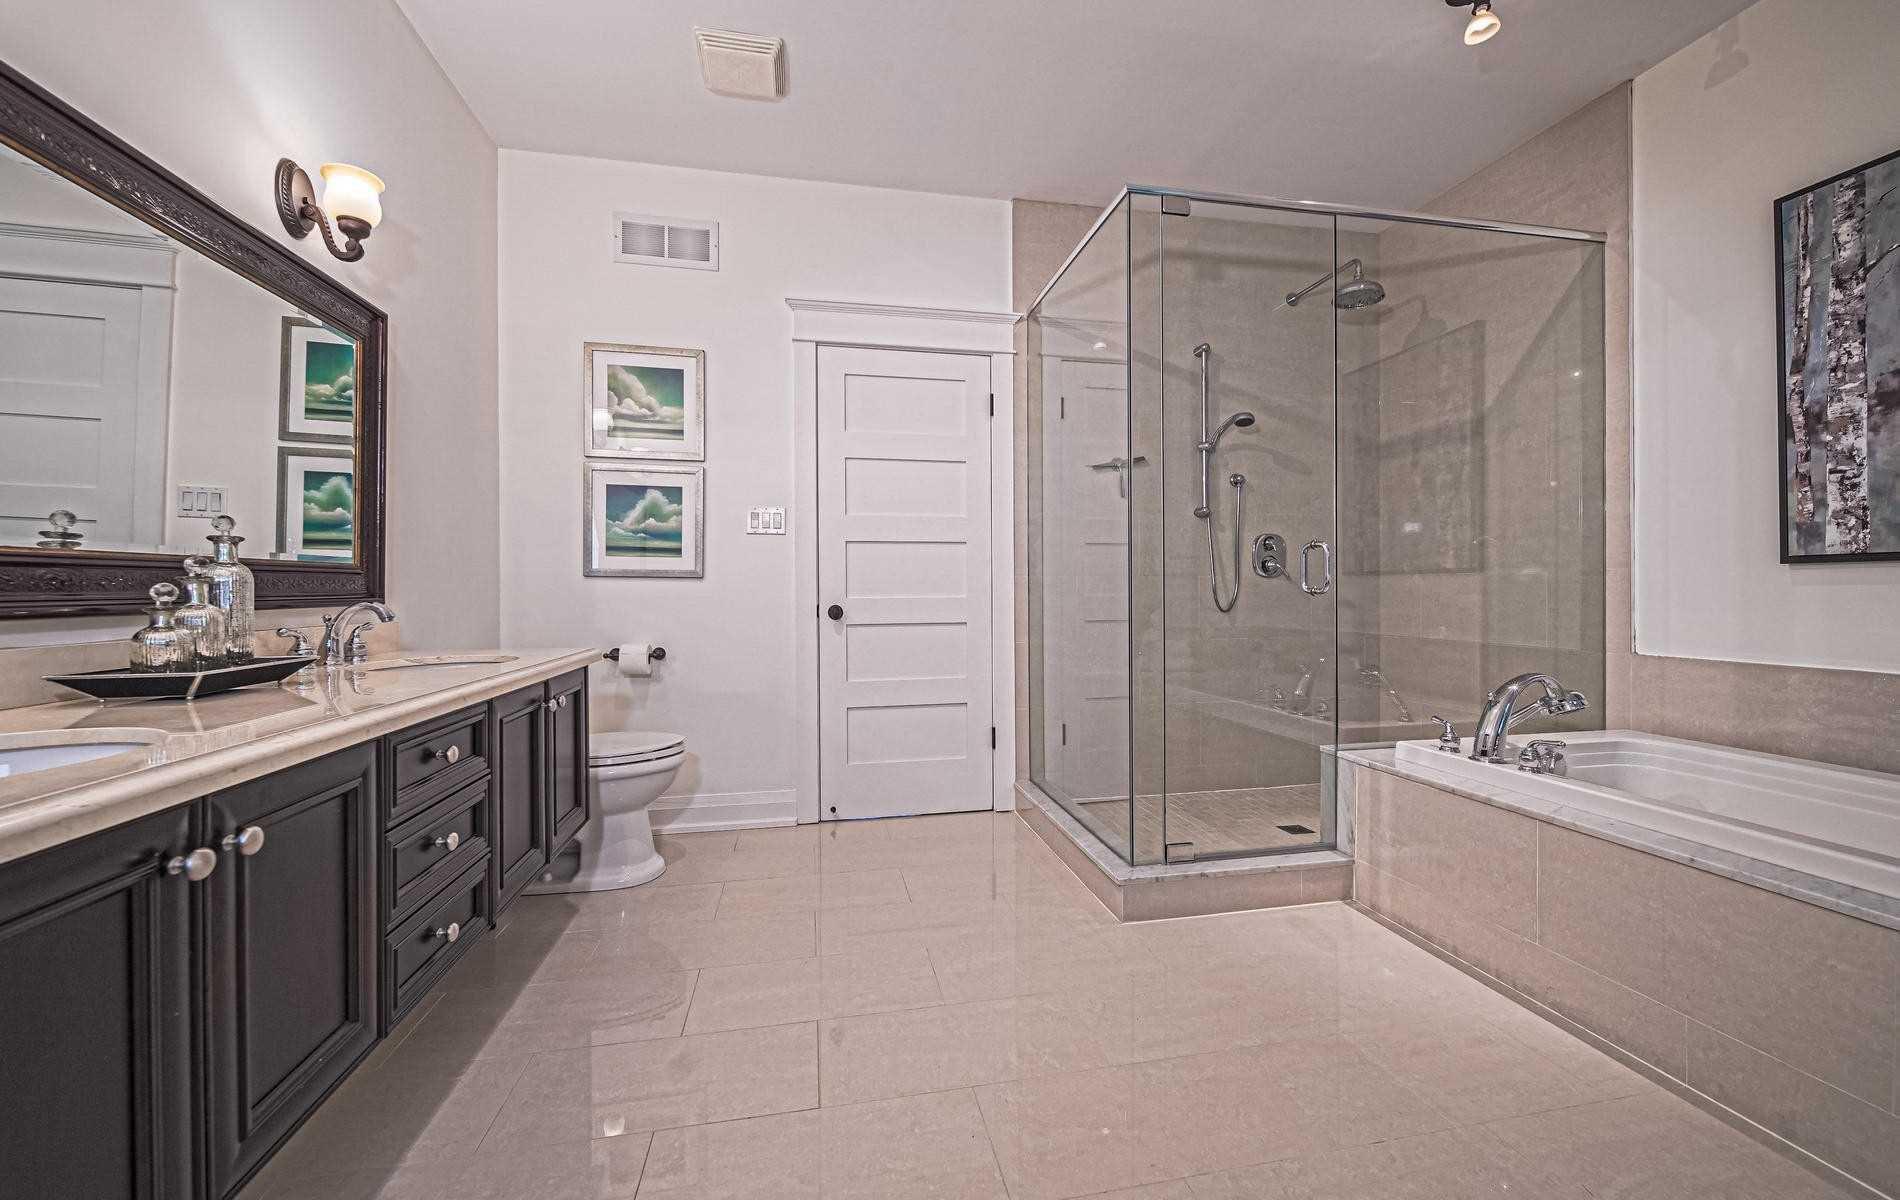 Photo 15: Photos: 216A Hamilton Street in Toronto: South Riverdale House (3-Storey) for sale (Toronto E01)  : MLS®# E4619870